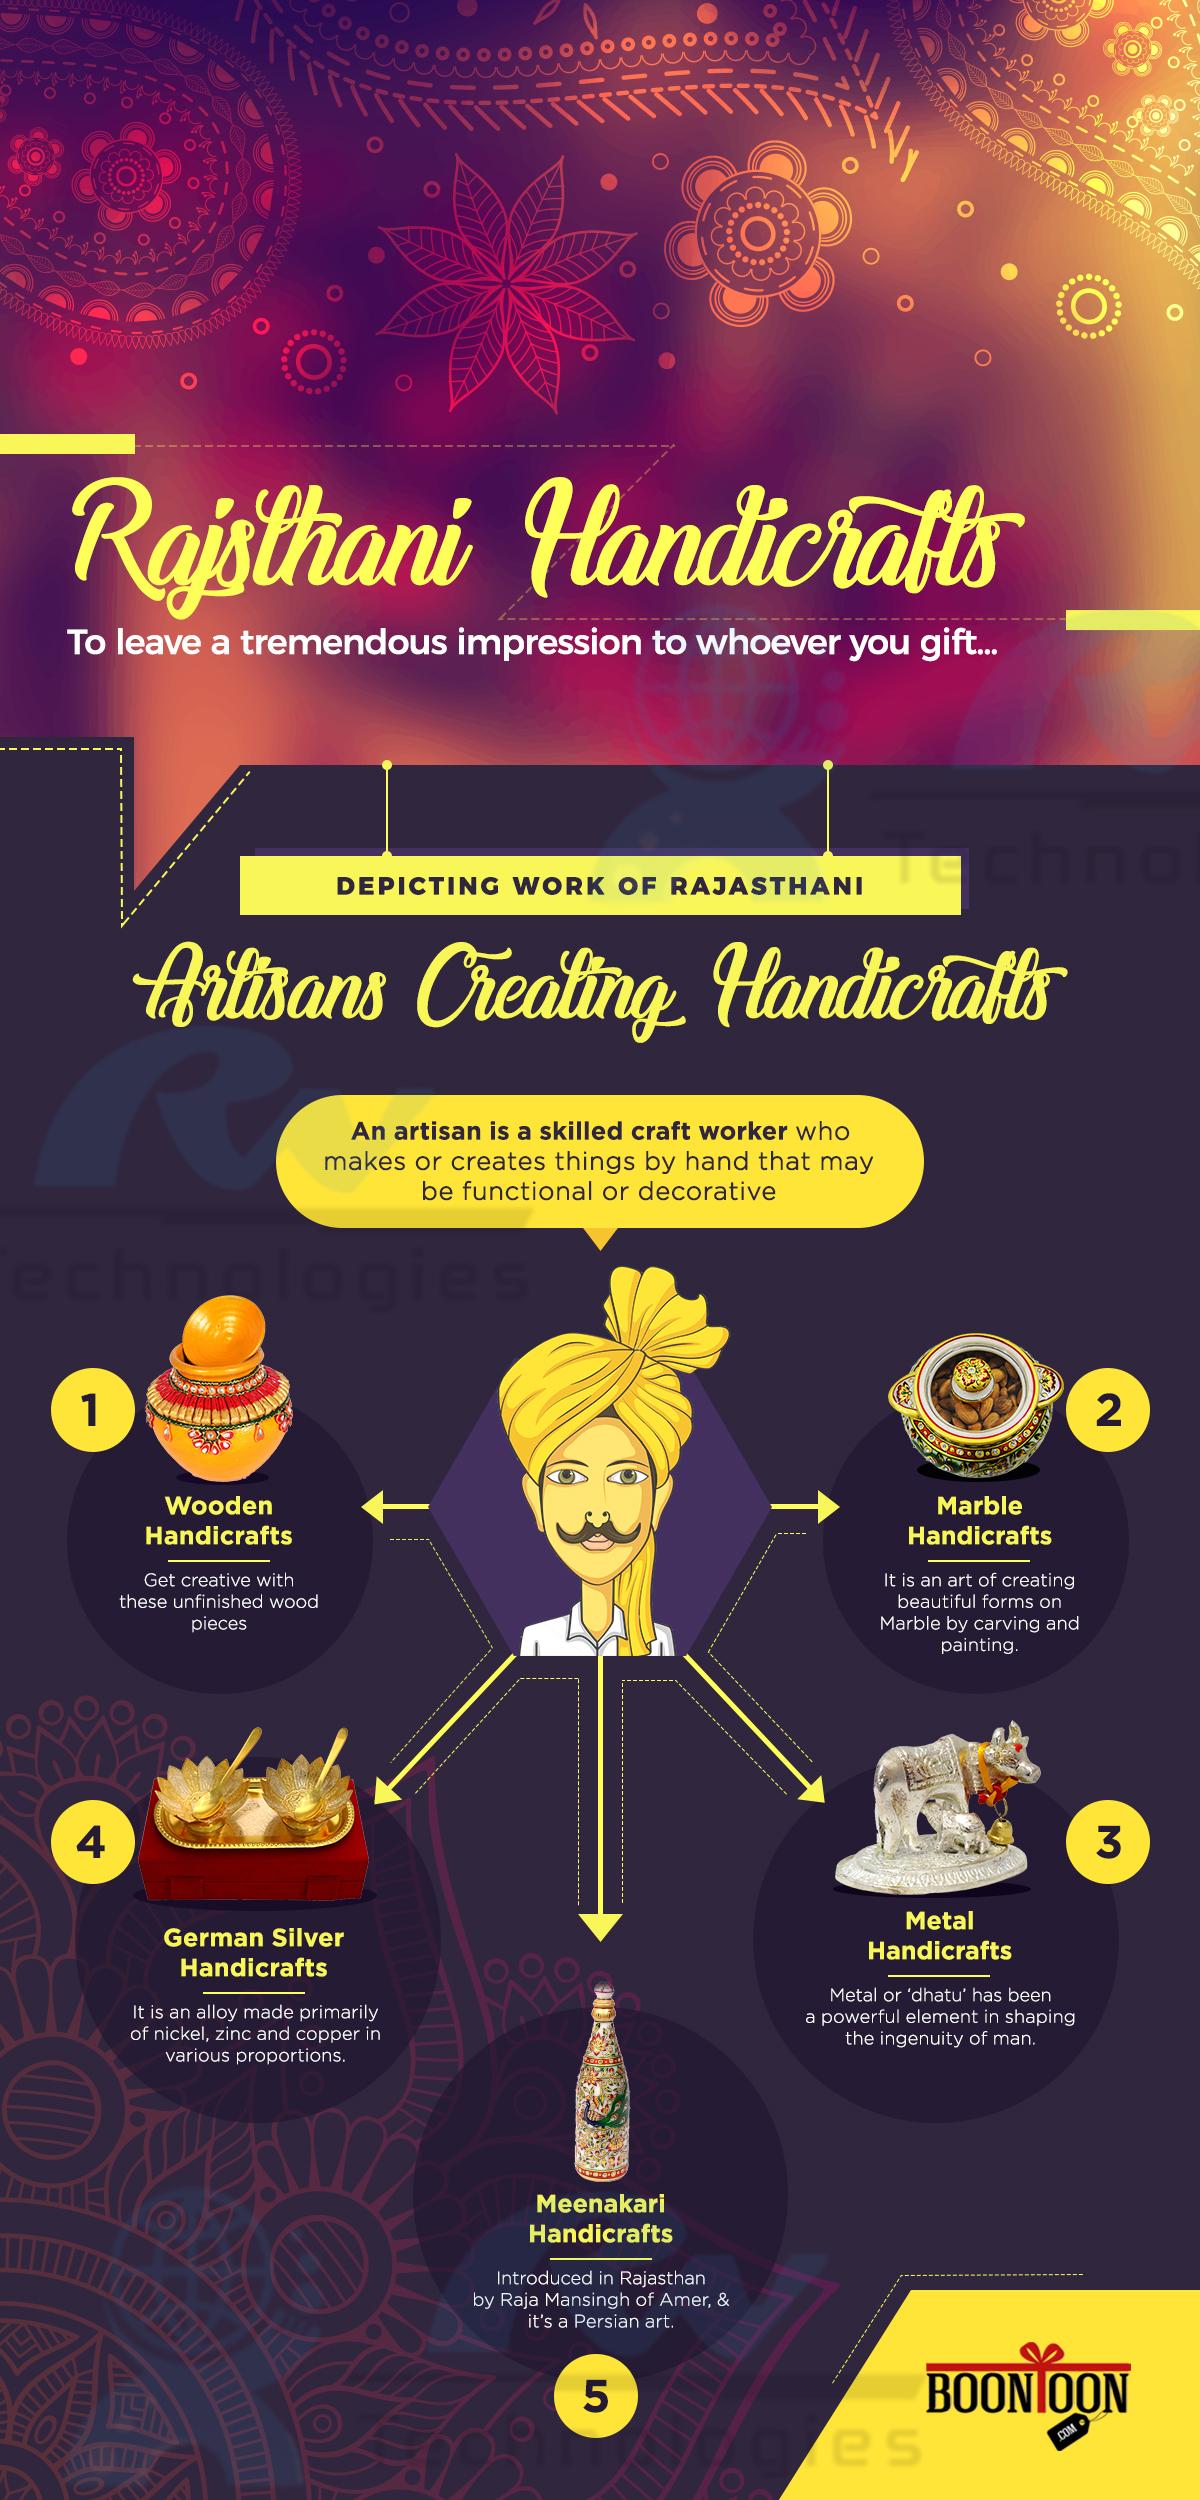 Rajasthan Handicrafts [Infographic]